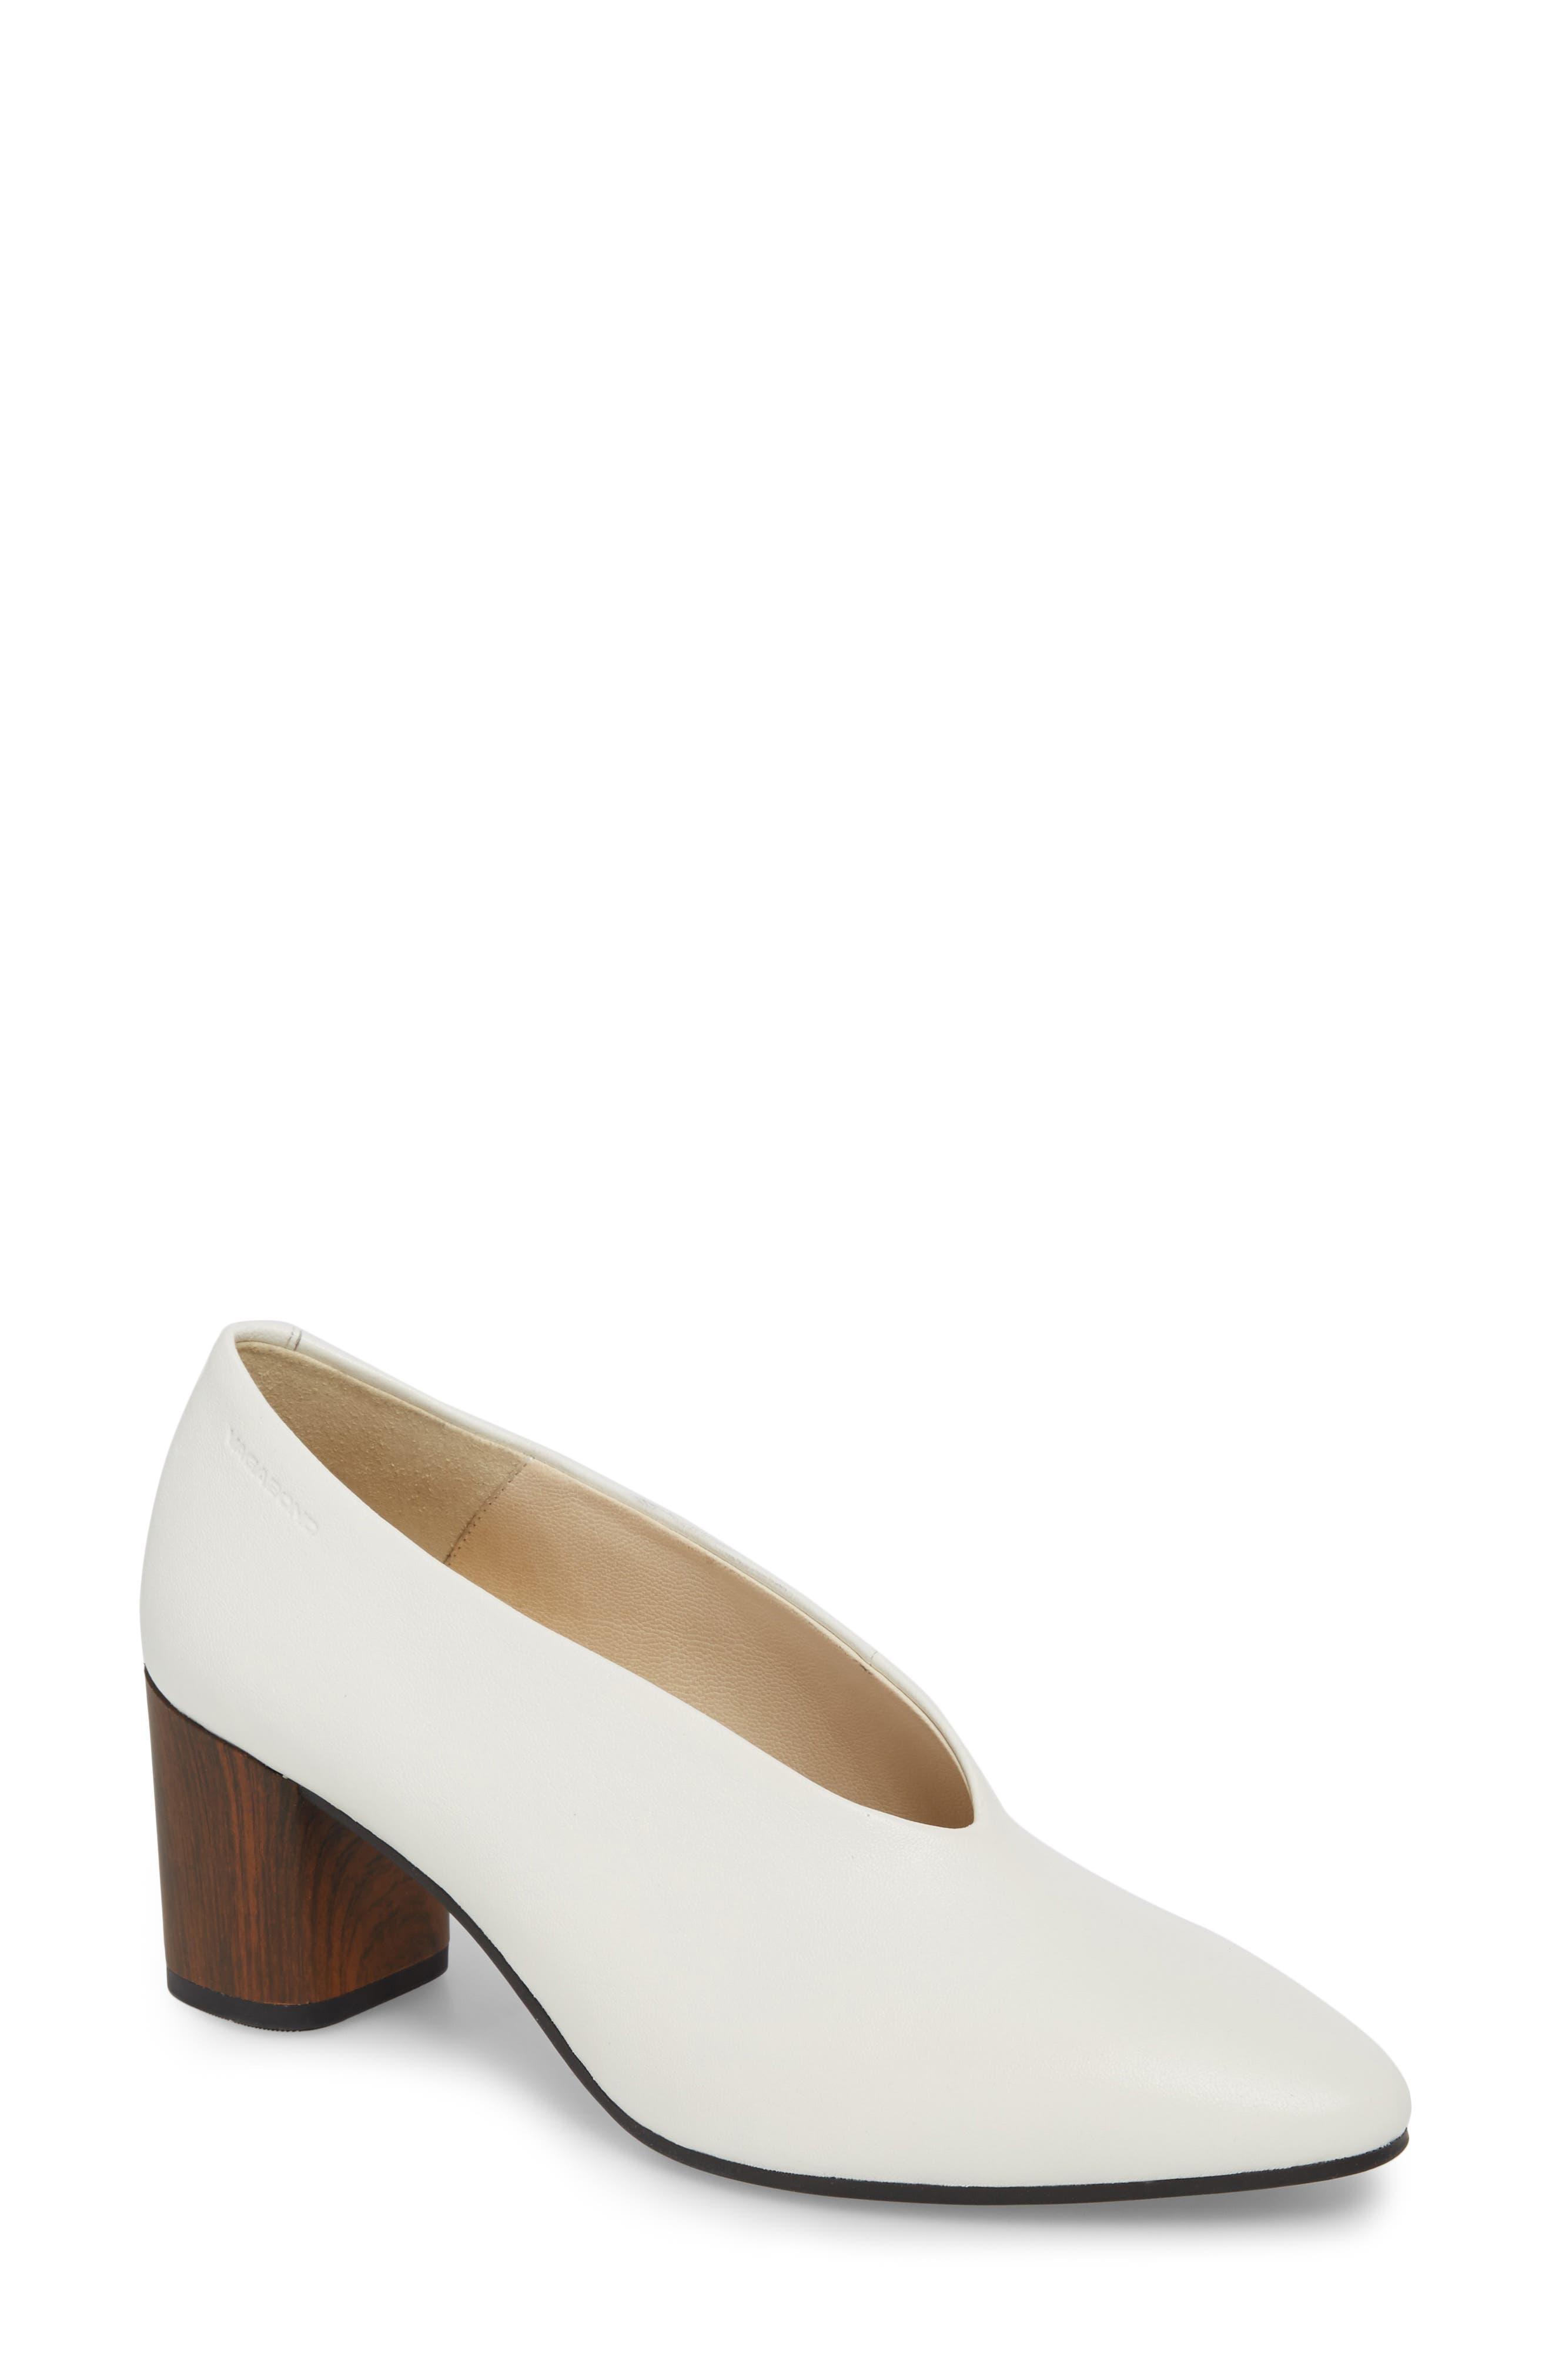 Eve Pump,                             Main thumbnail 1, color,                             Cream White Leather